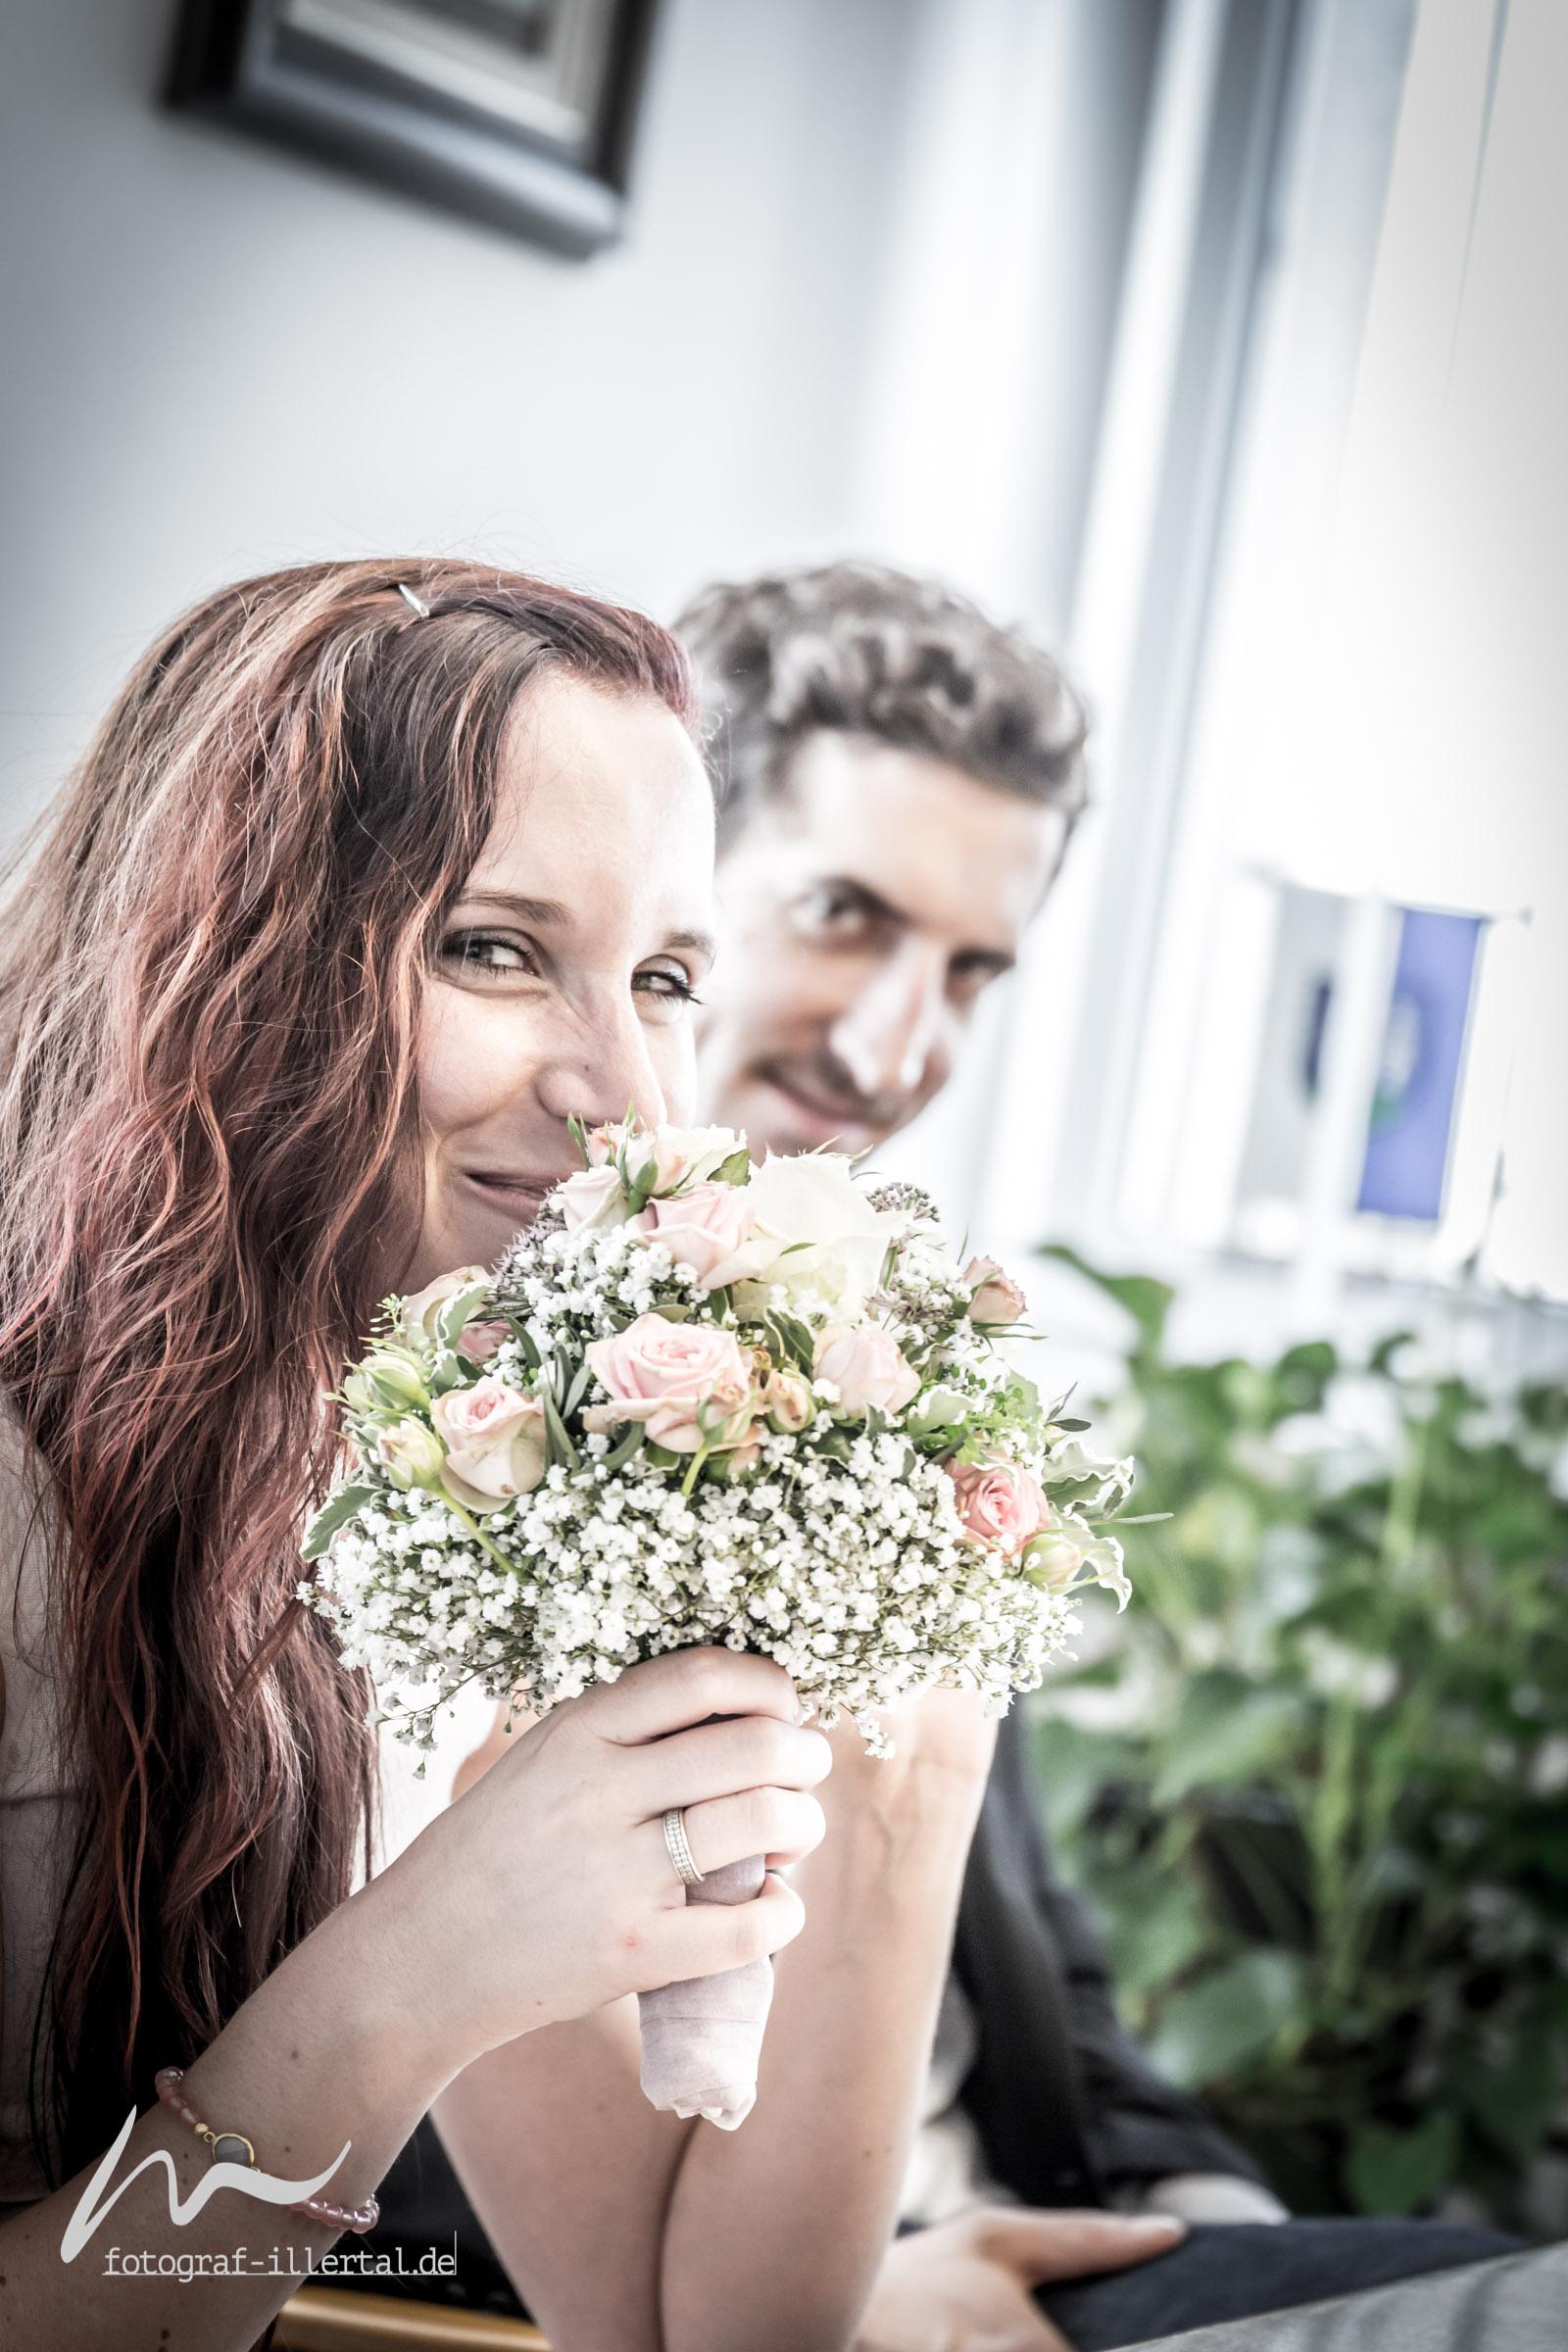 Fotograf Illertal-Christian Miller-Hochzeitsfotografie-_MG_1385